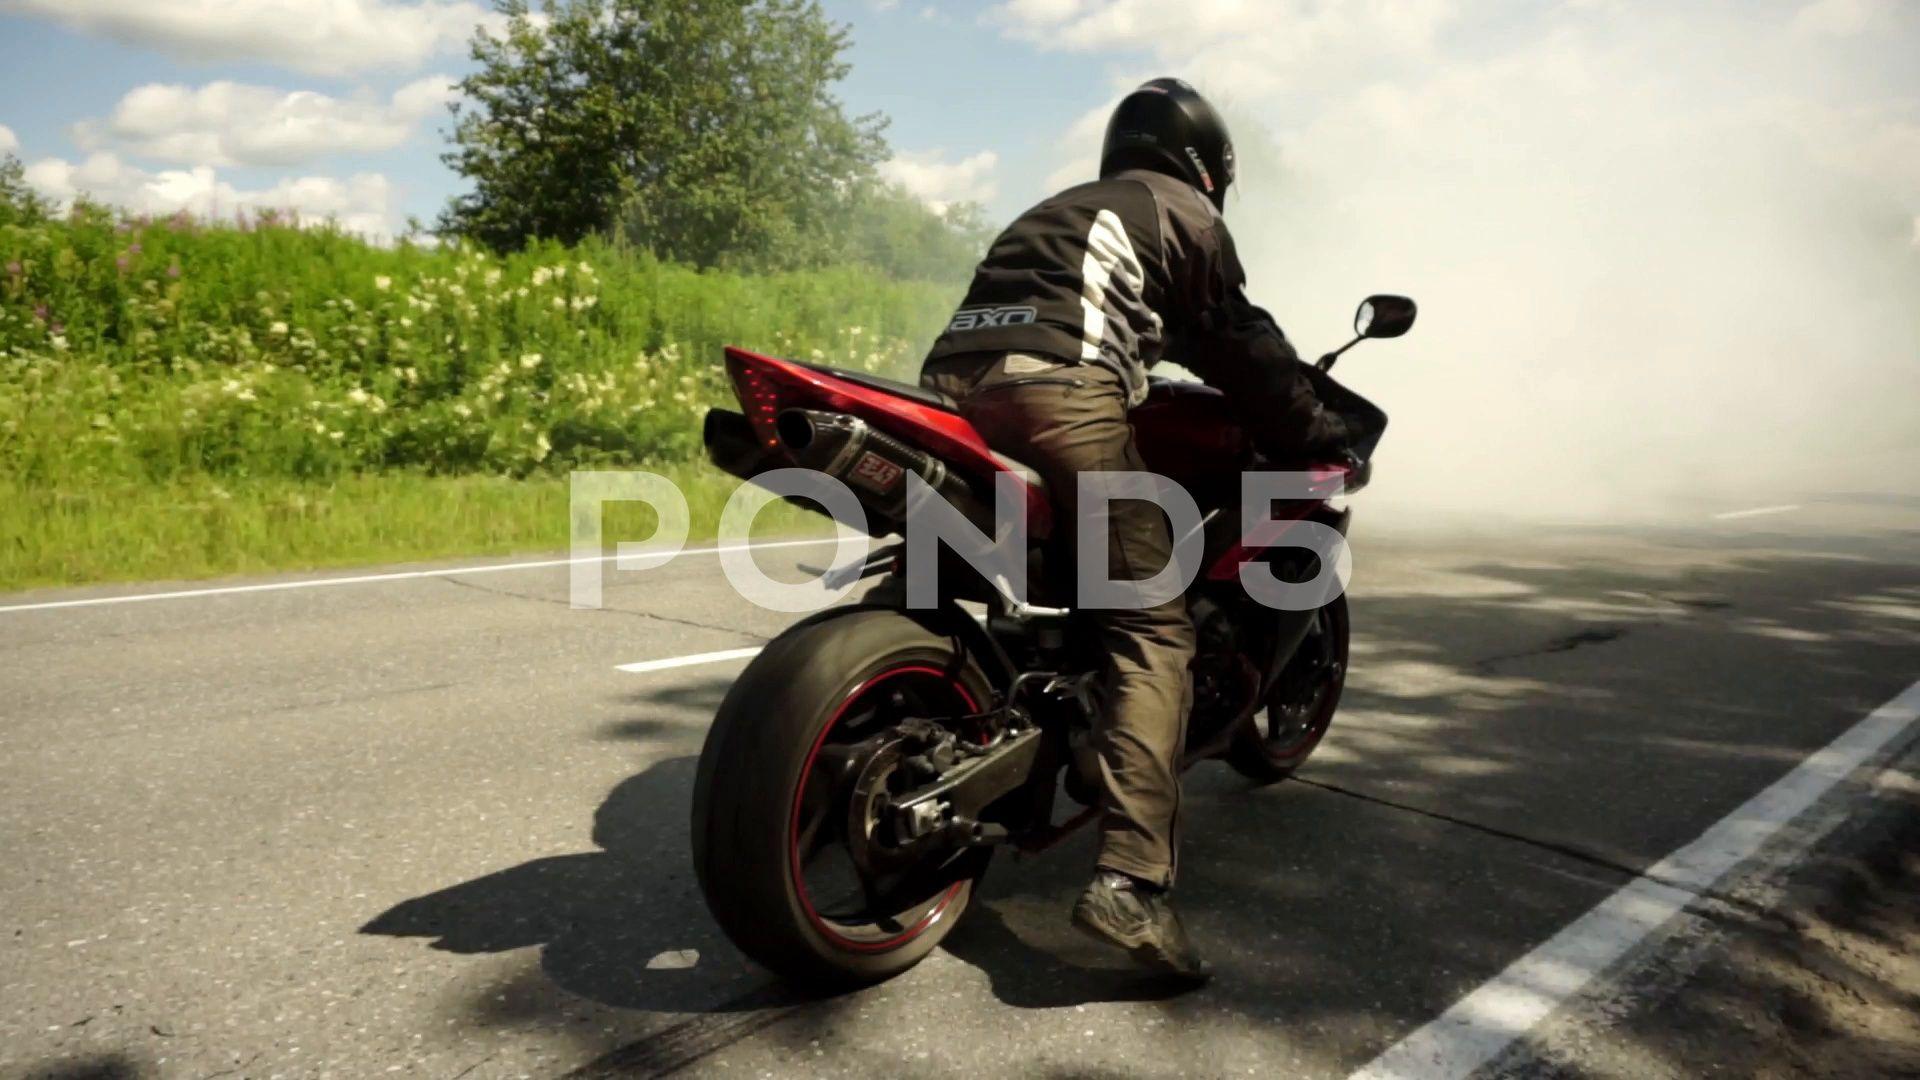 Professional Motocross Fmx Motorcycle Rider Drives Through Smoke